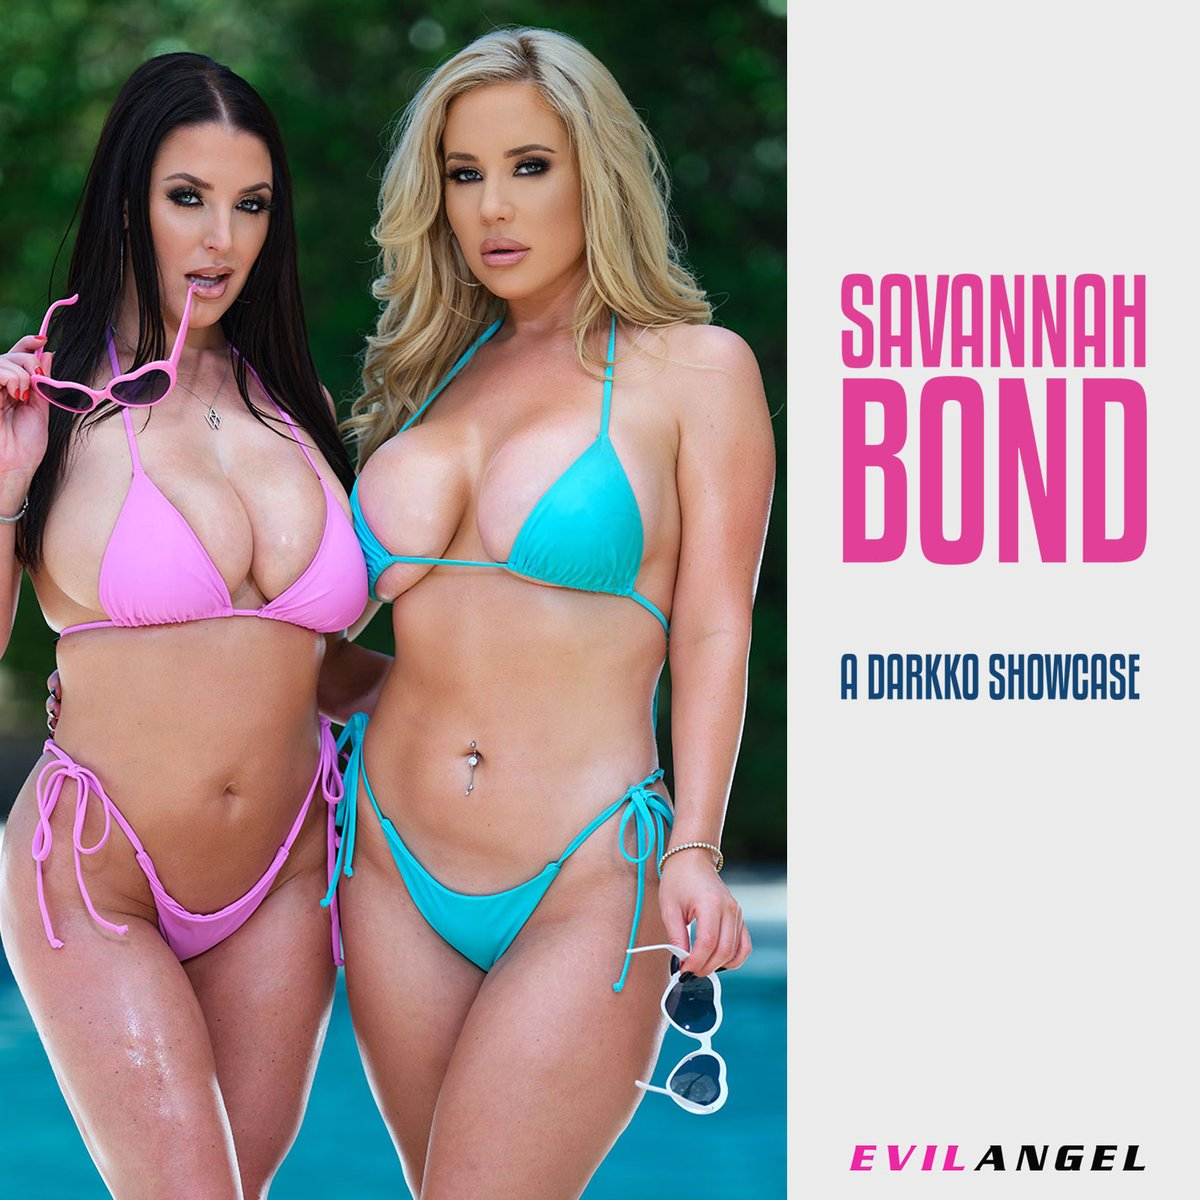 Anal threesome with @savannahbondxxx and @ANGELAWHITE 😈💦 watch it here 🔗evilan.gl/3CYtR2E 🎥@jonnidarkko 🍆@JaxSlayherTV